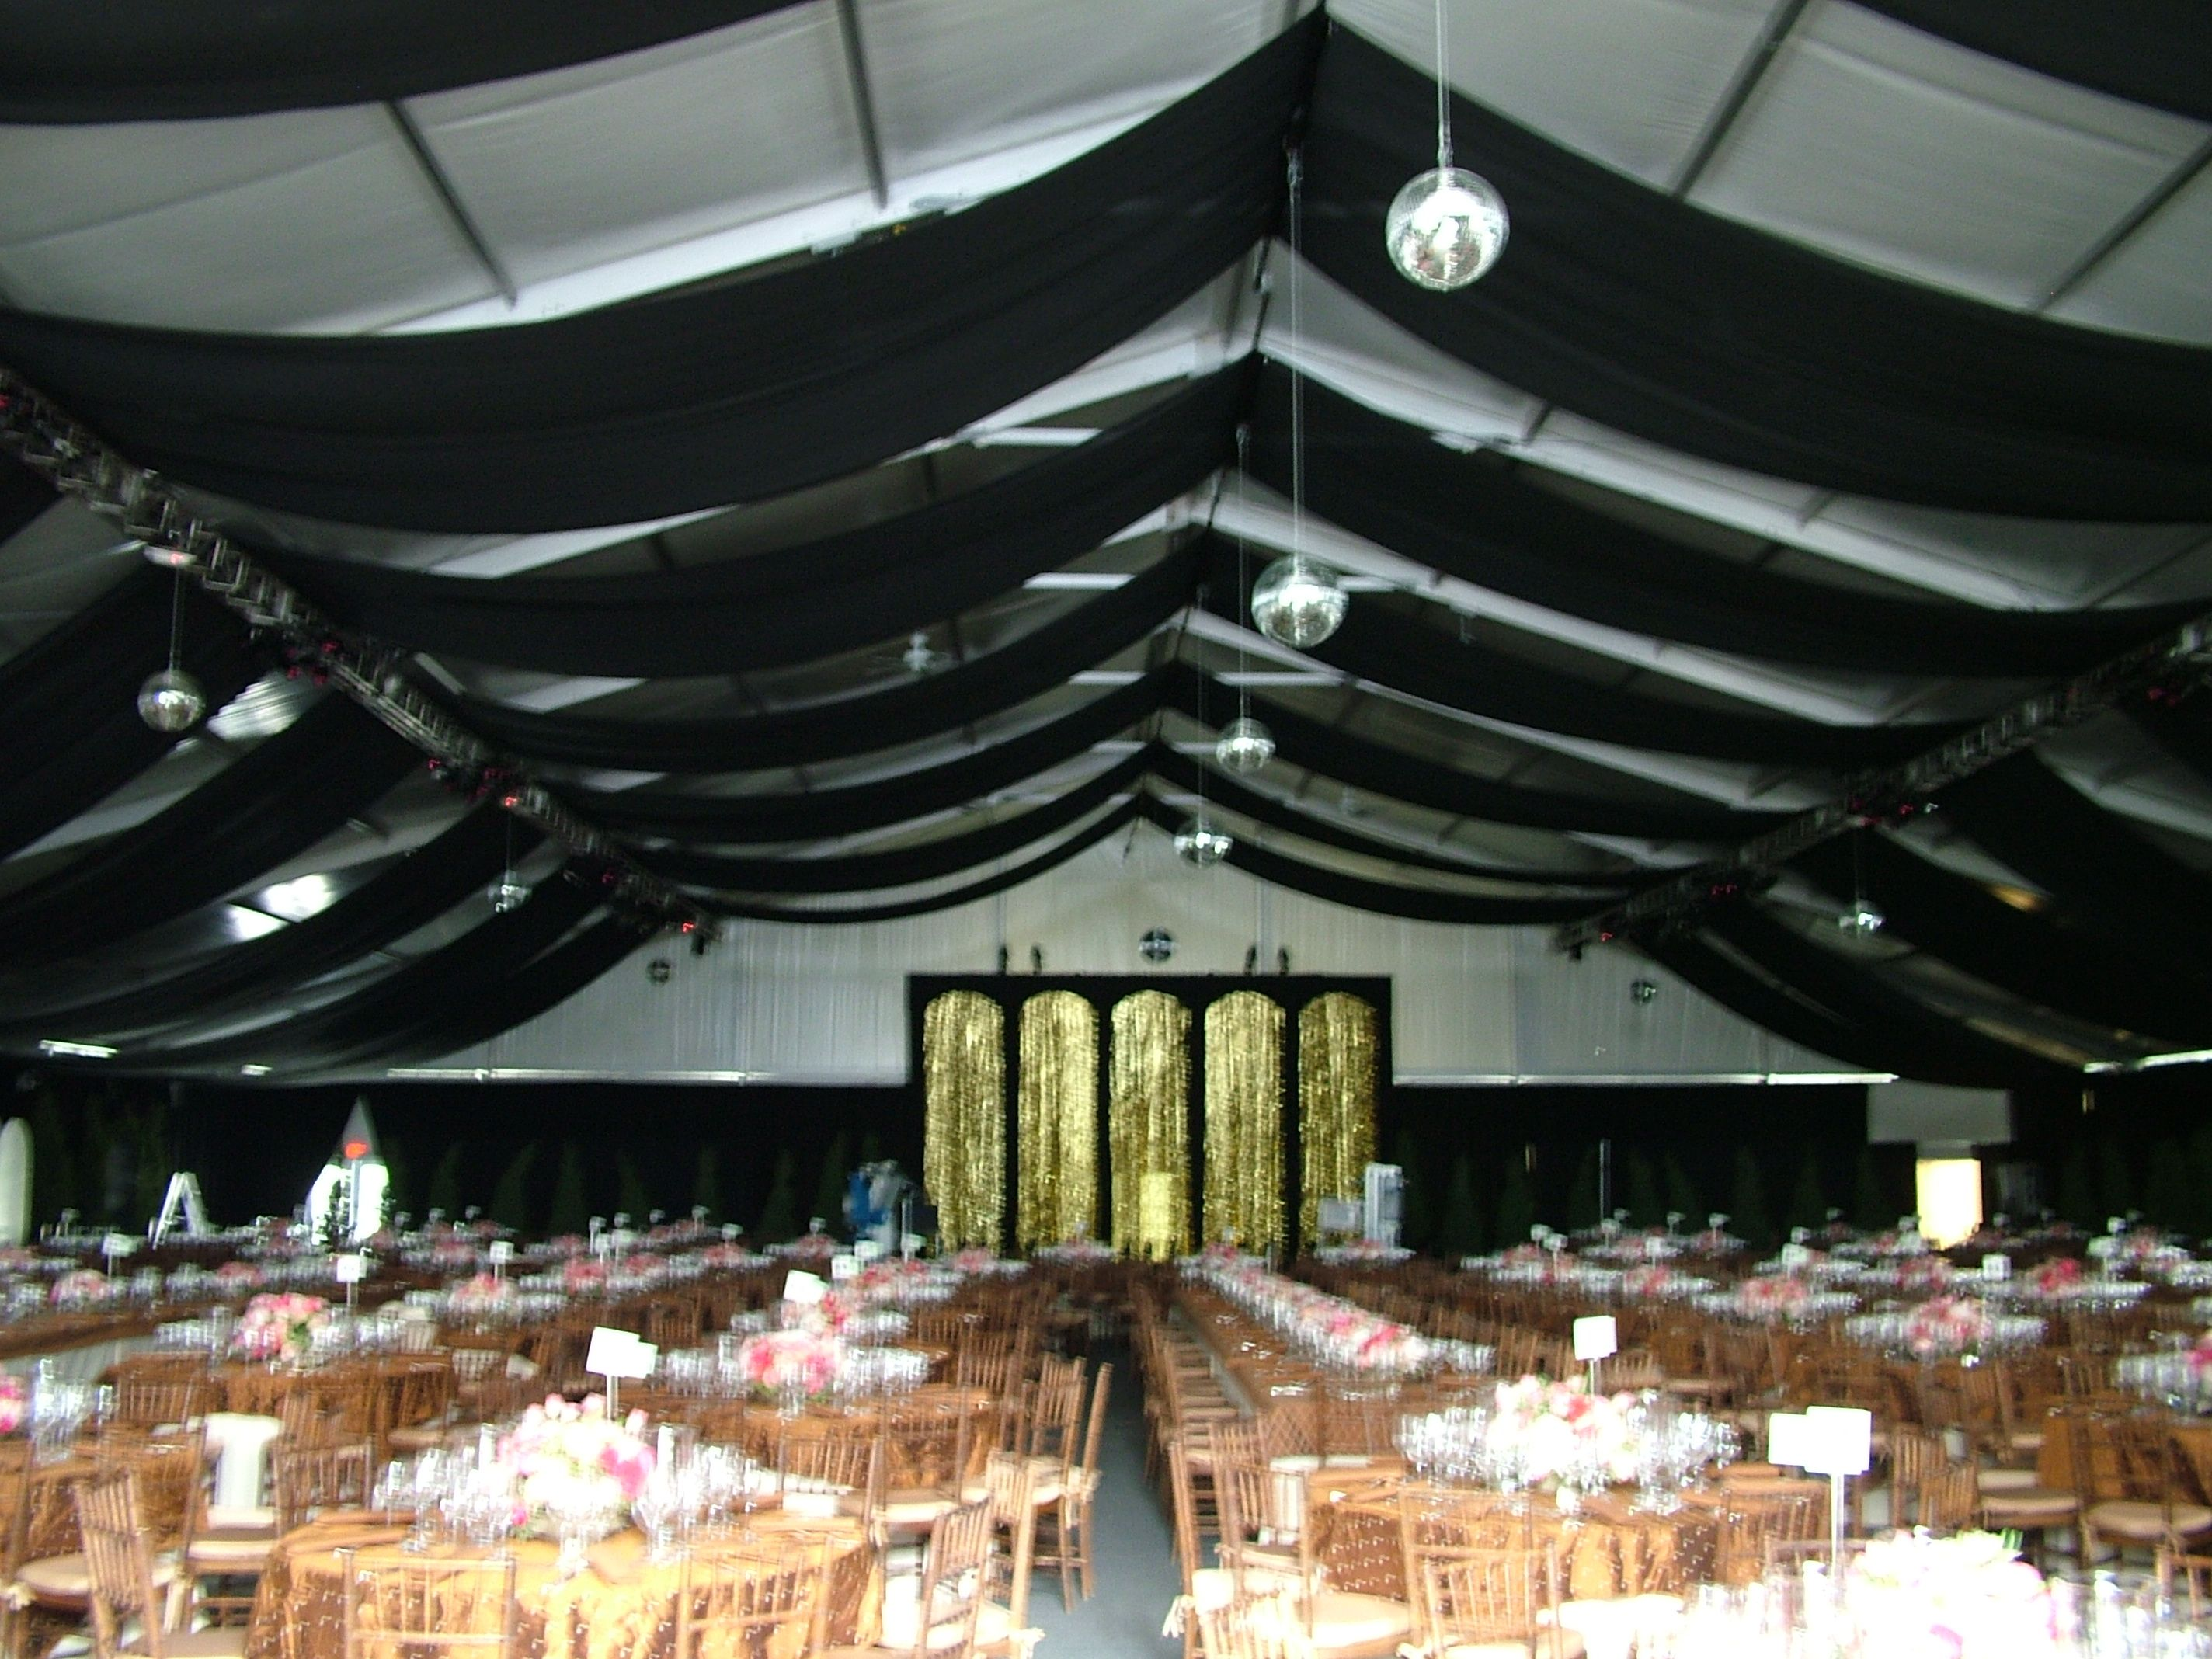 Black Ceiling treatment for a venue